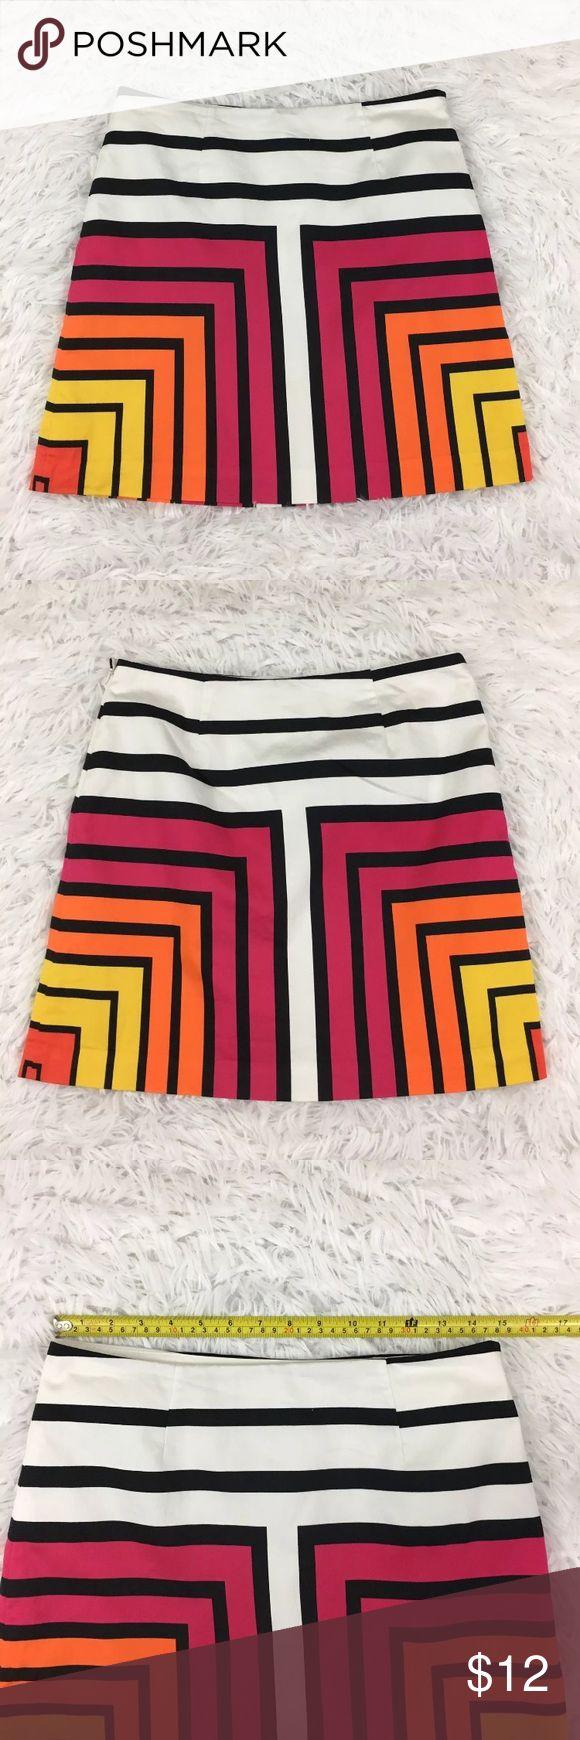 Worthington Geometric Print Bold Retro Mini Skirt Worthington Geometric Print Bold Retro Mini Skirt - Geometric patterned stripes and bold pink, orange, and yellow make this retro inspired a line mini pop! Worthington Skirts Mini